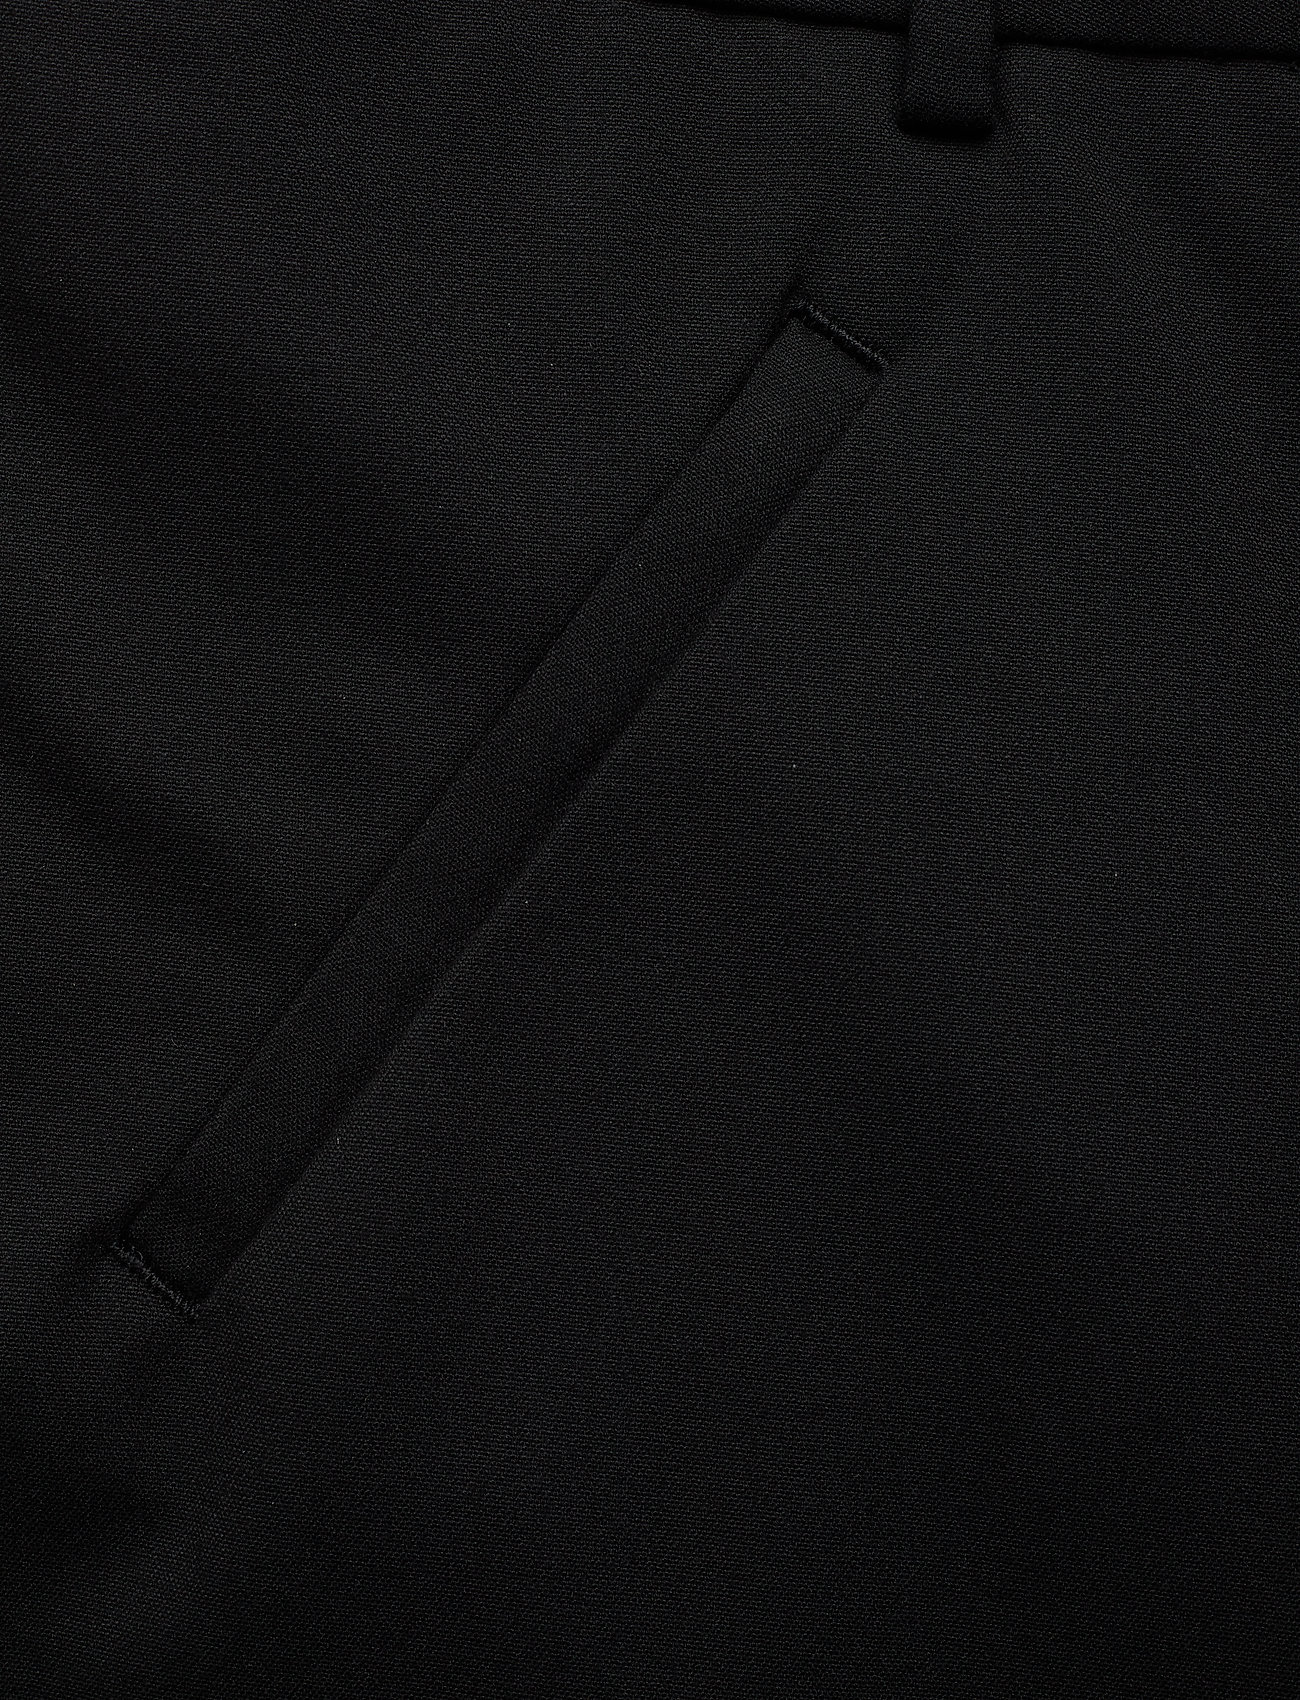 Fiveunits Angelie 225 - Byxor Black Slim